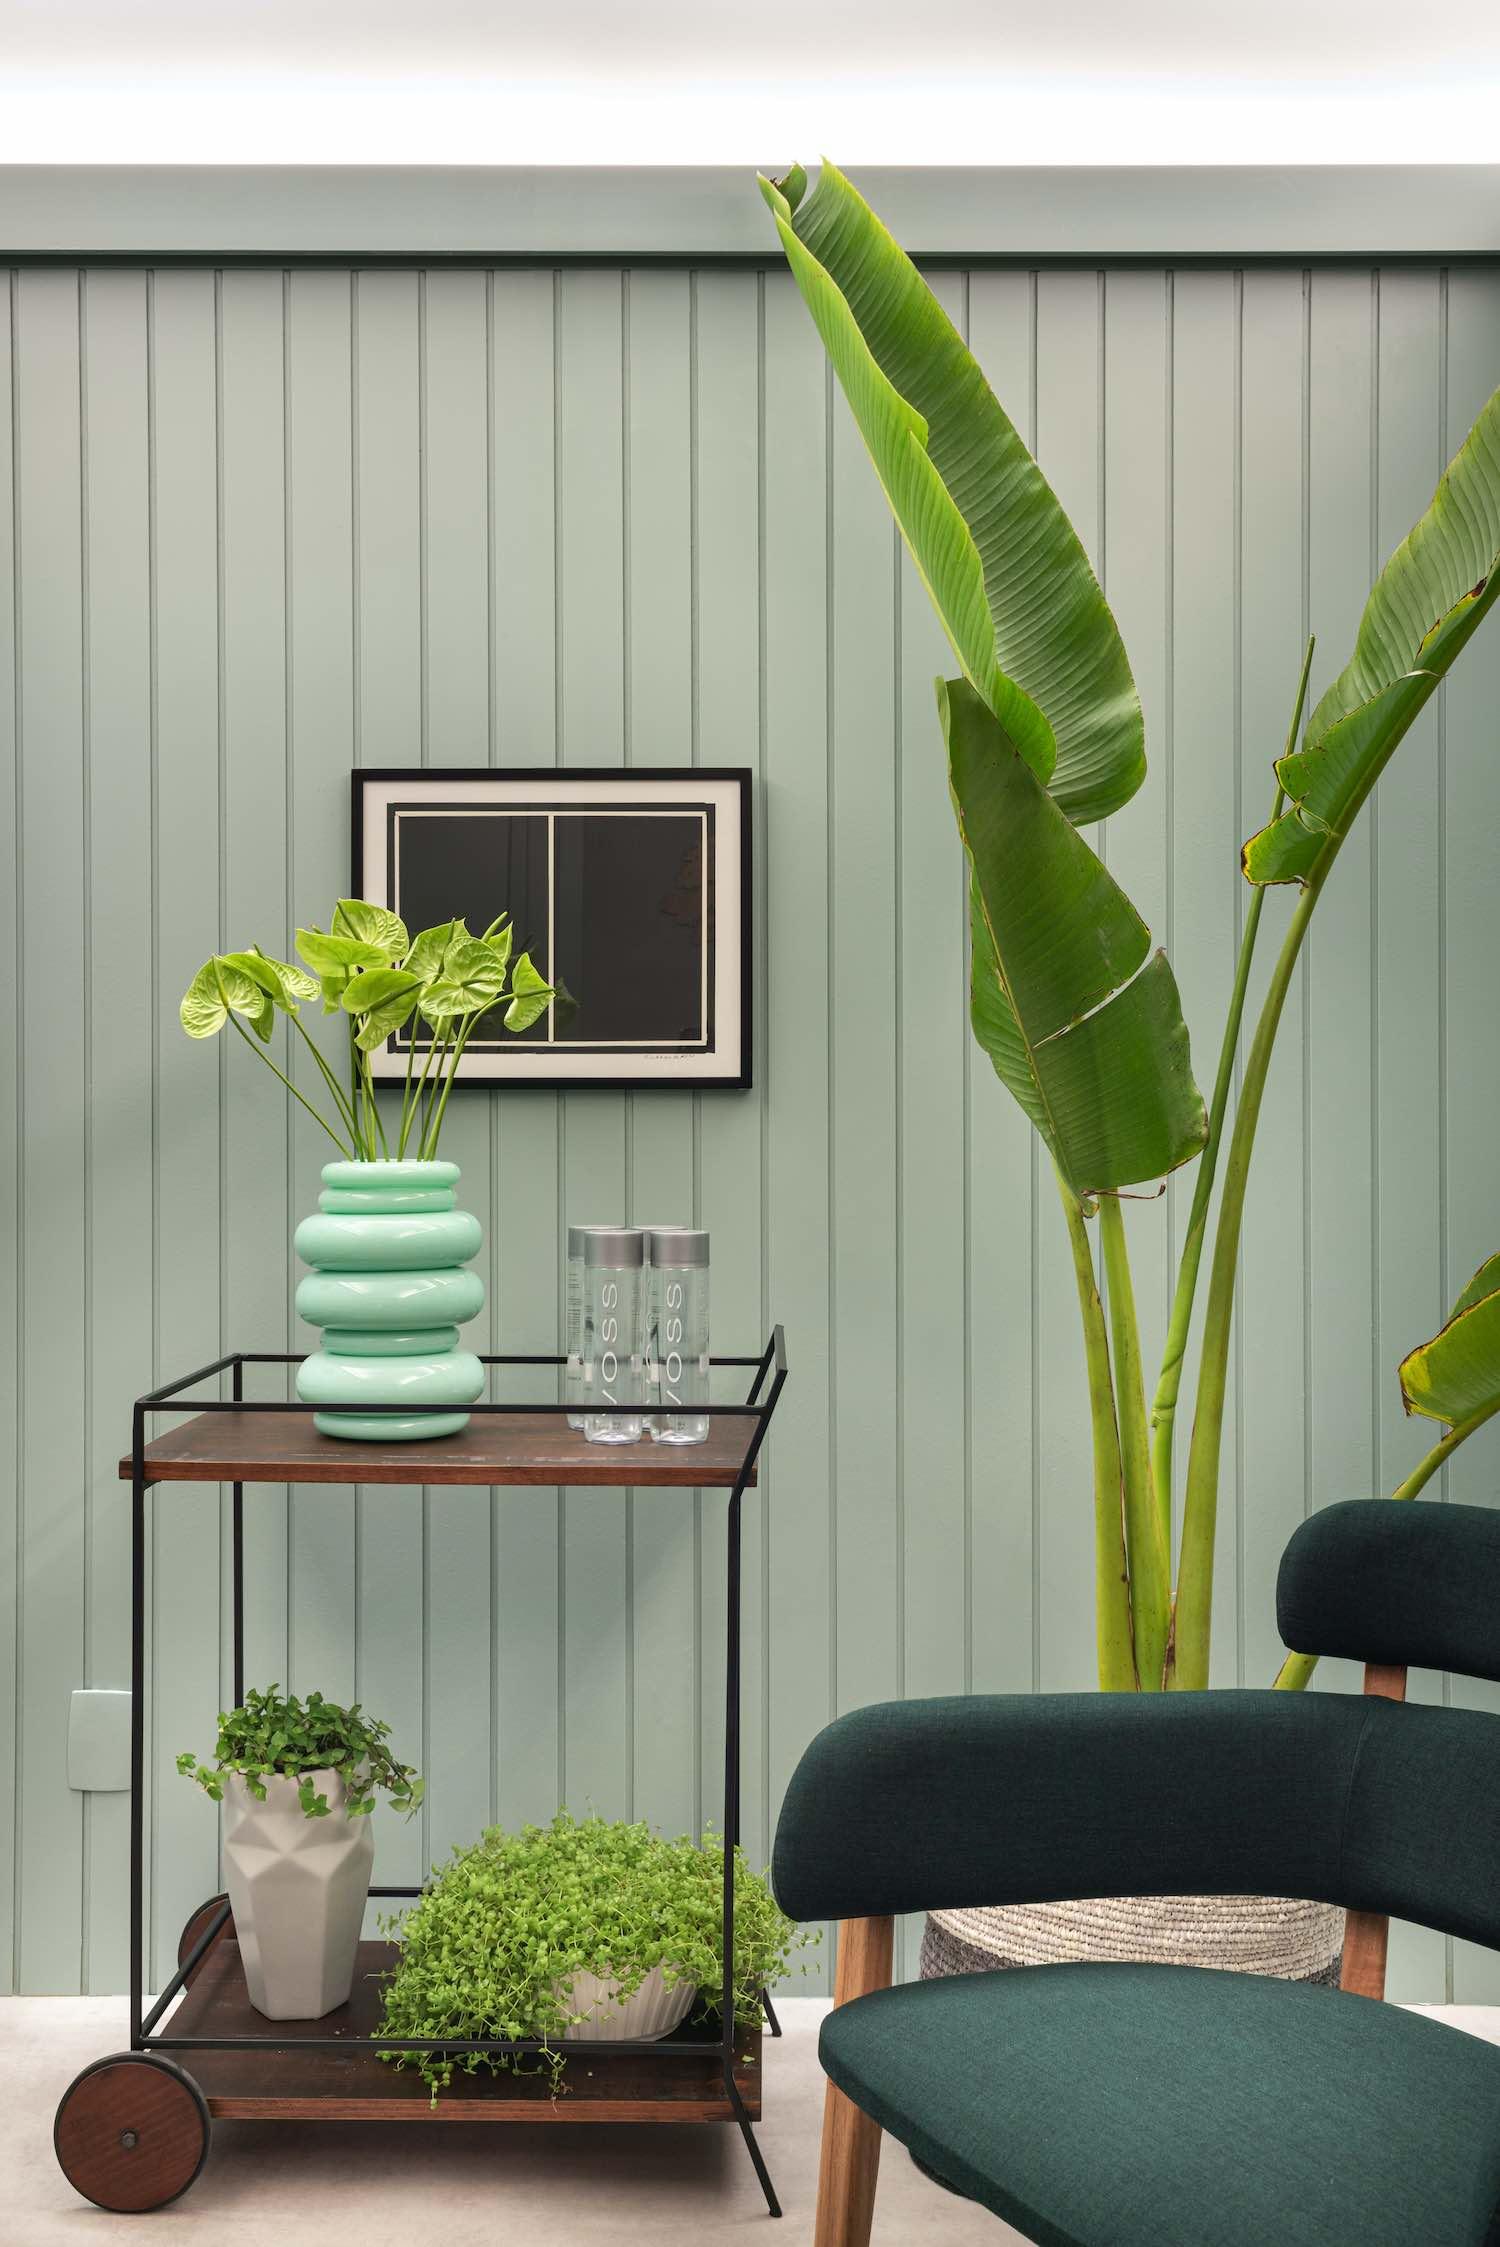 banana plant inside the room